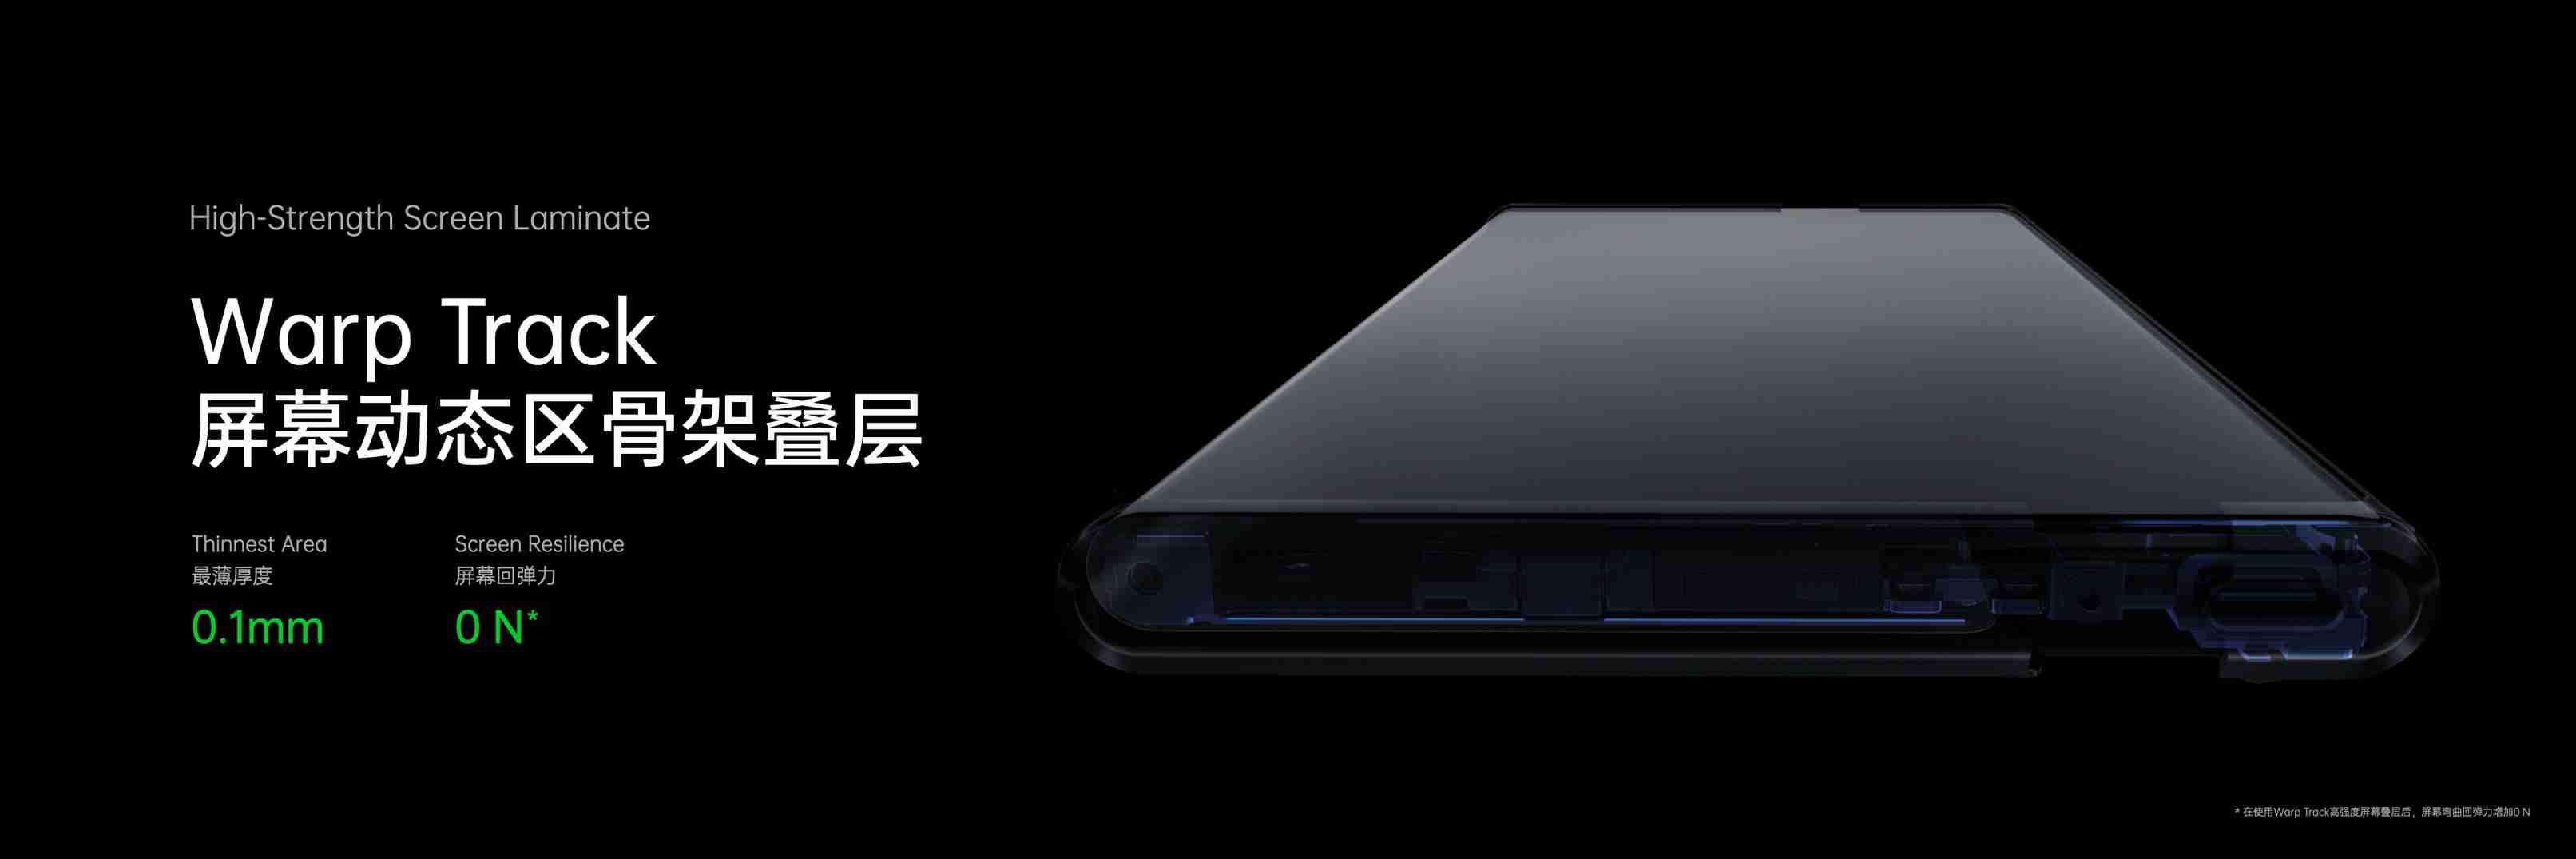 OPPO X 2021  屏幕动态去骨架叠层